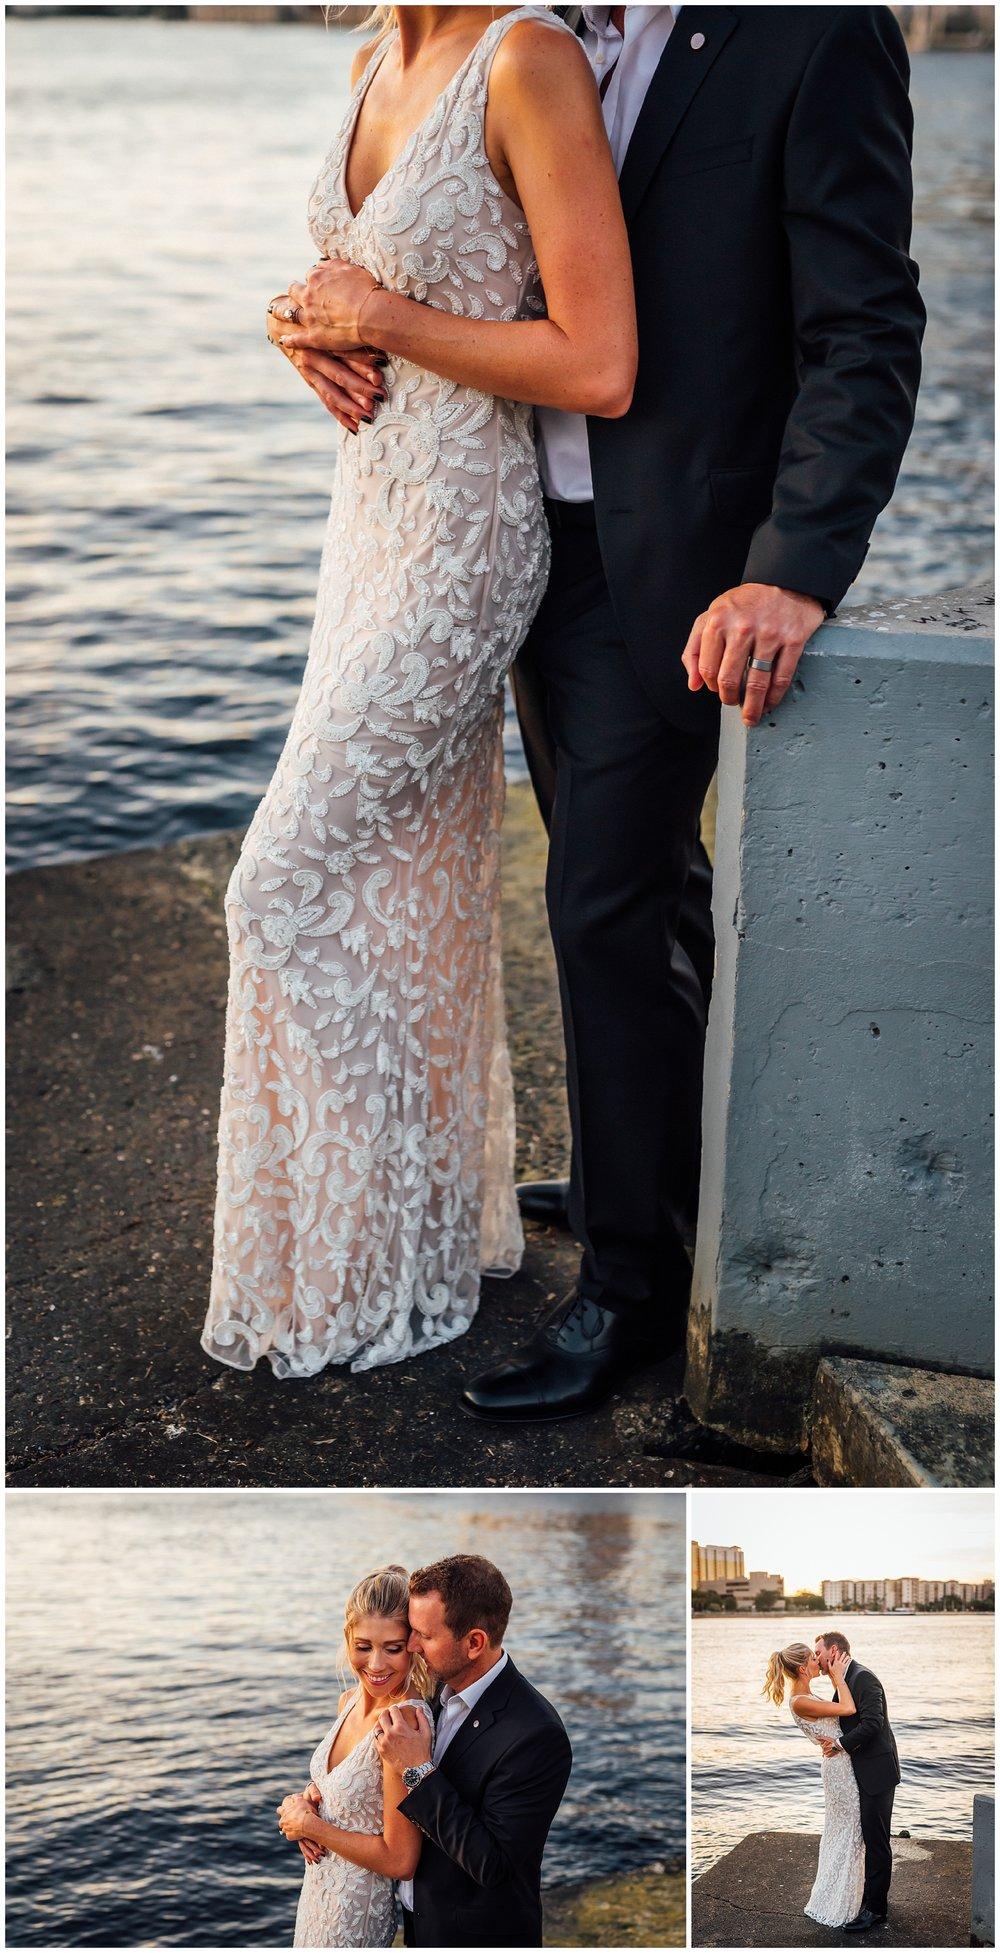 Tampa-wedding-photographer-downtown-bhldn-intimate_0058.jpg